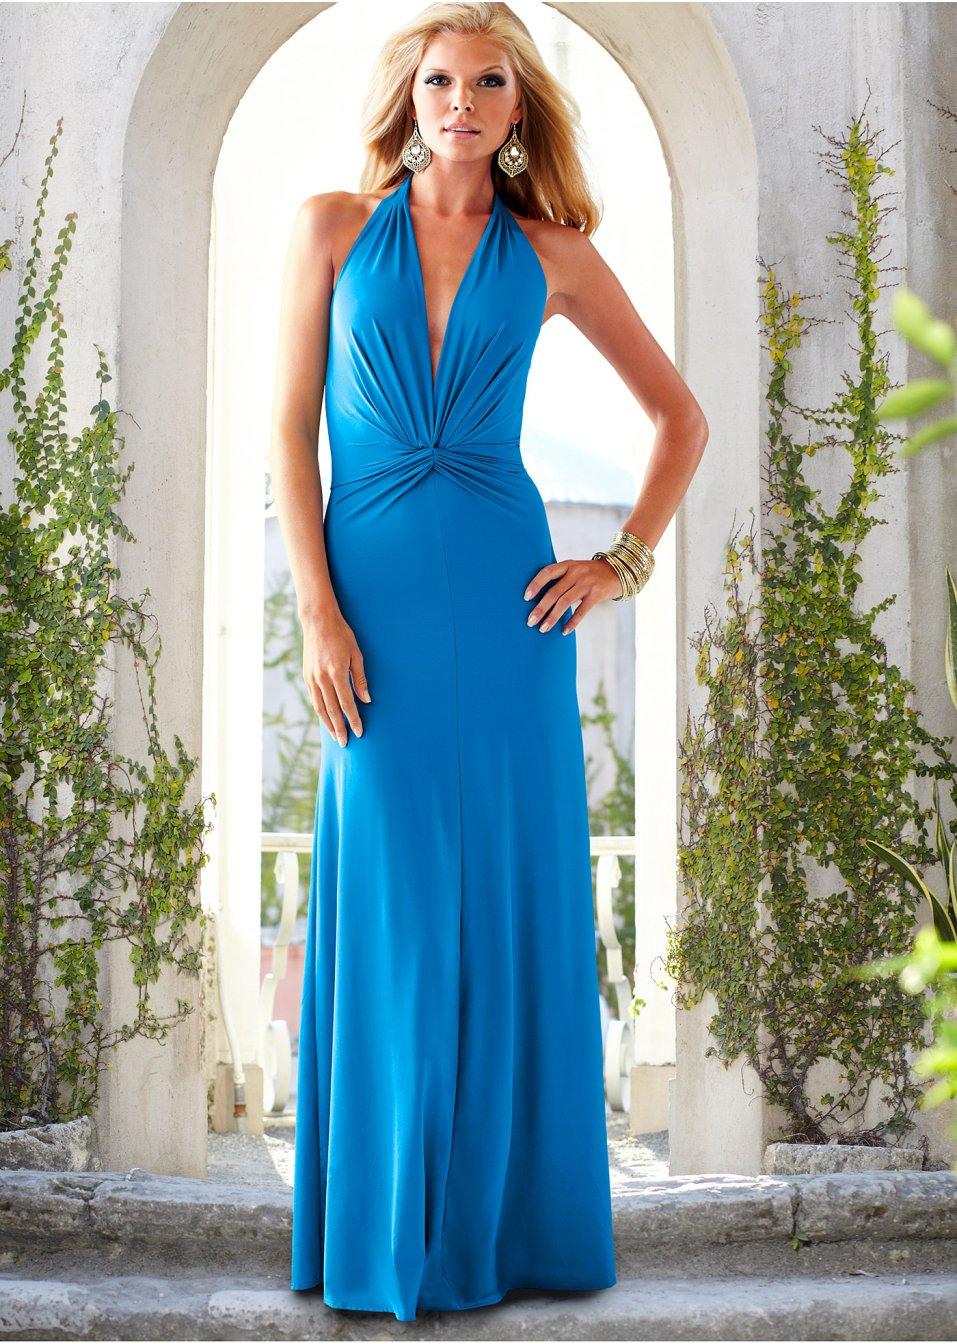 13 Wunderbar Abendkleid Jersey Lang Ärmel15 Genial Abendkleid Jersey Lang für 2019